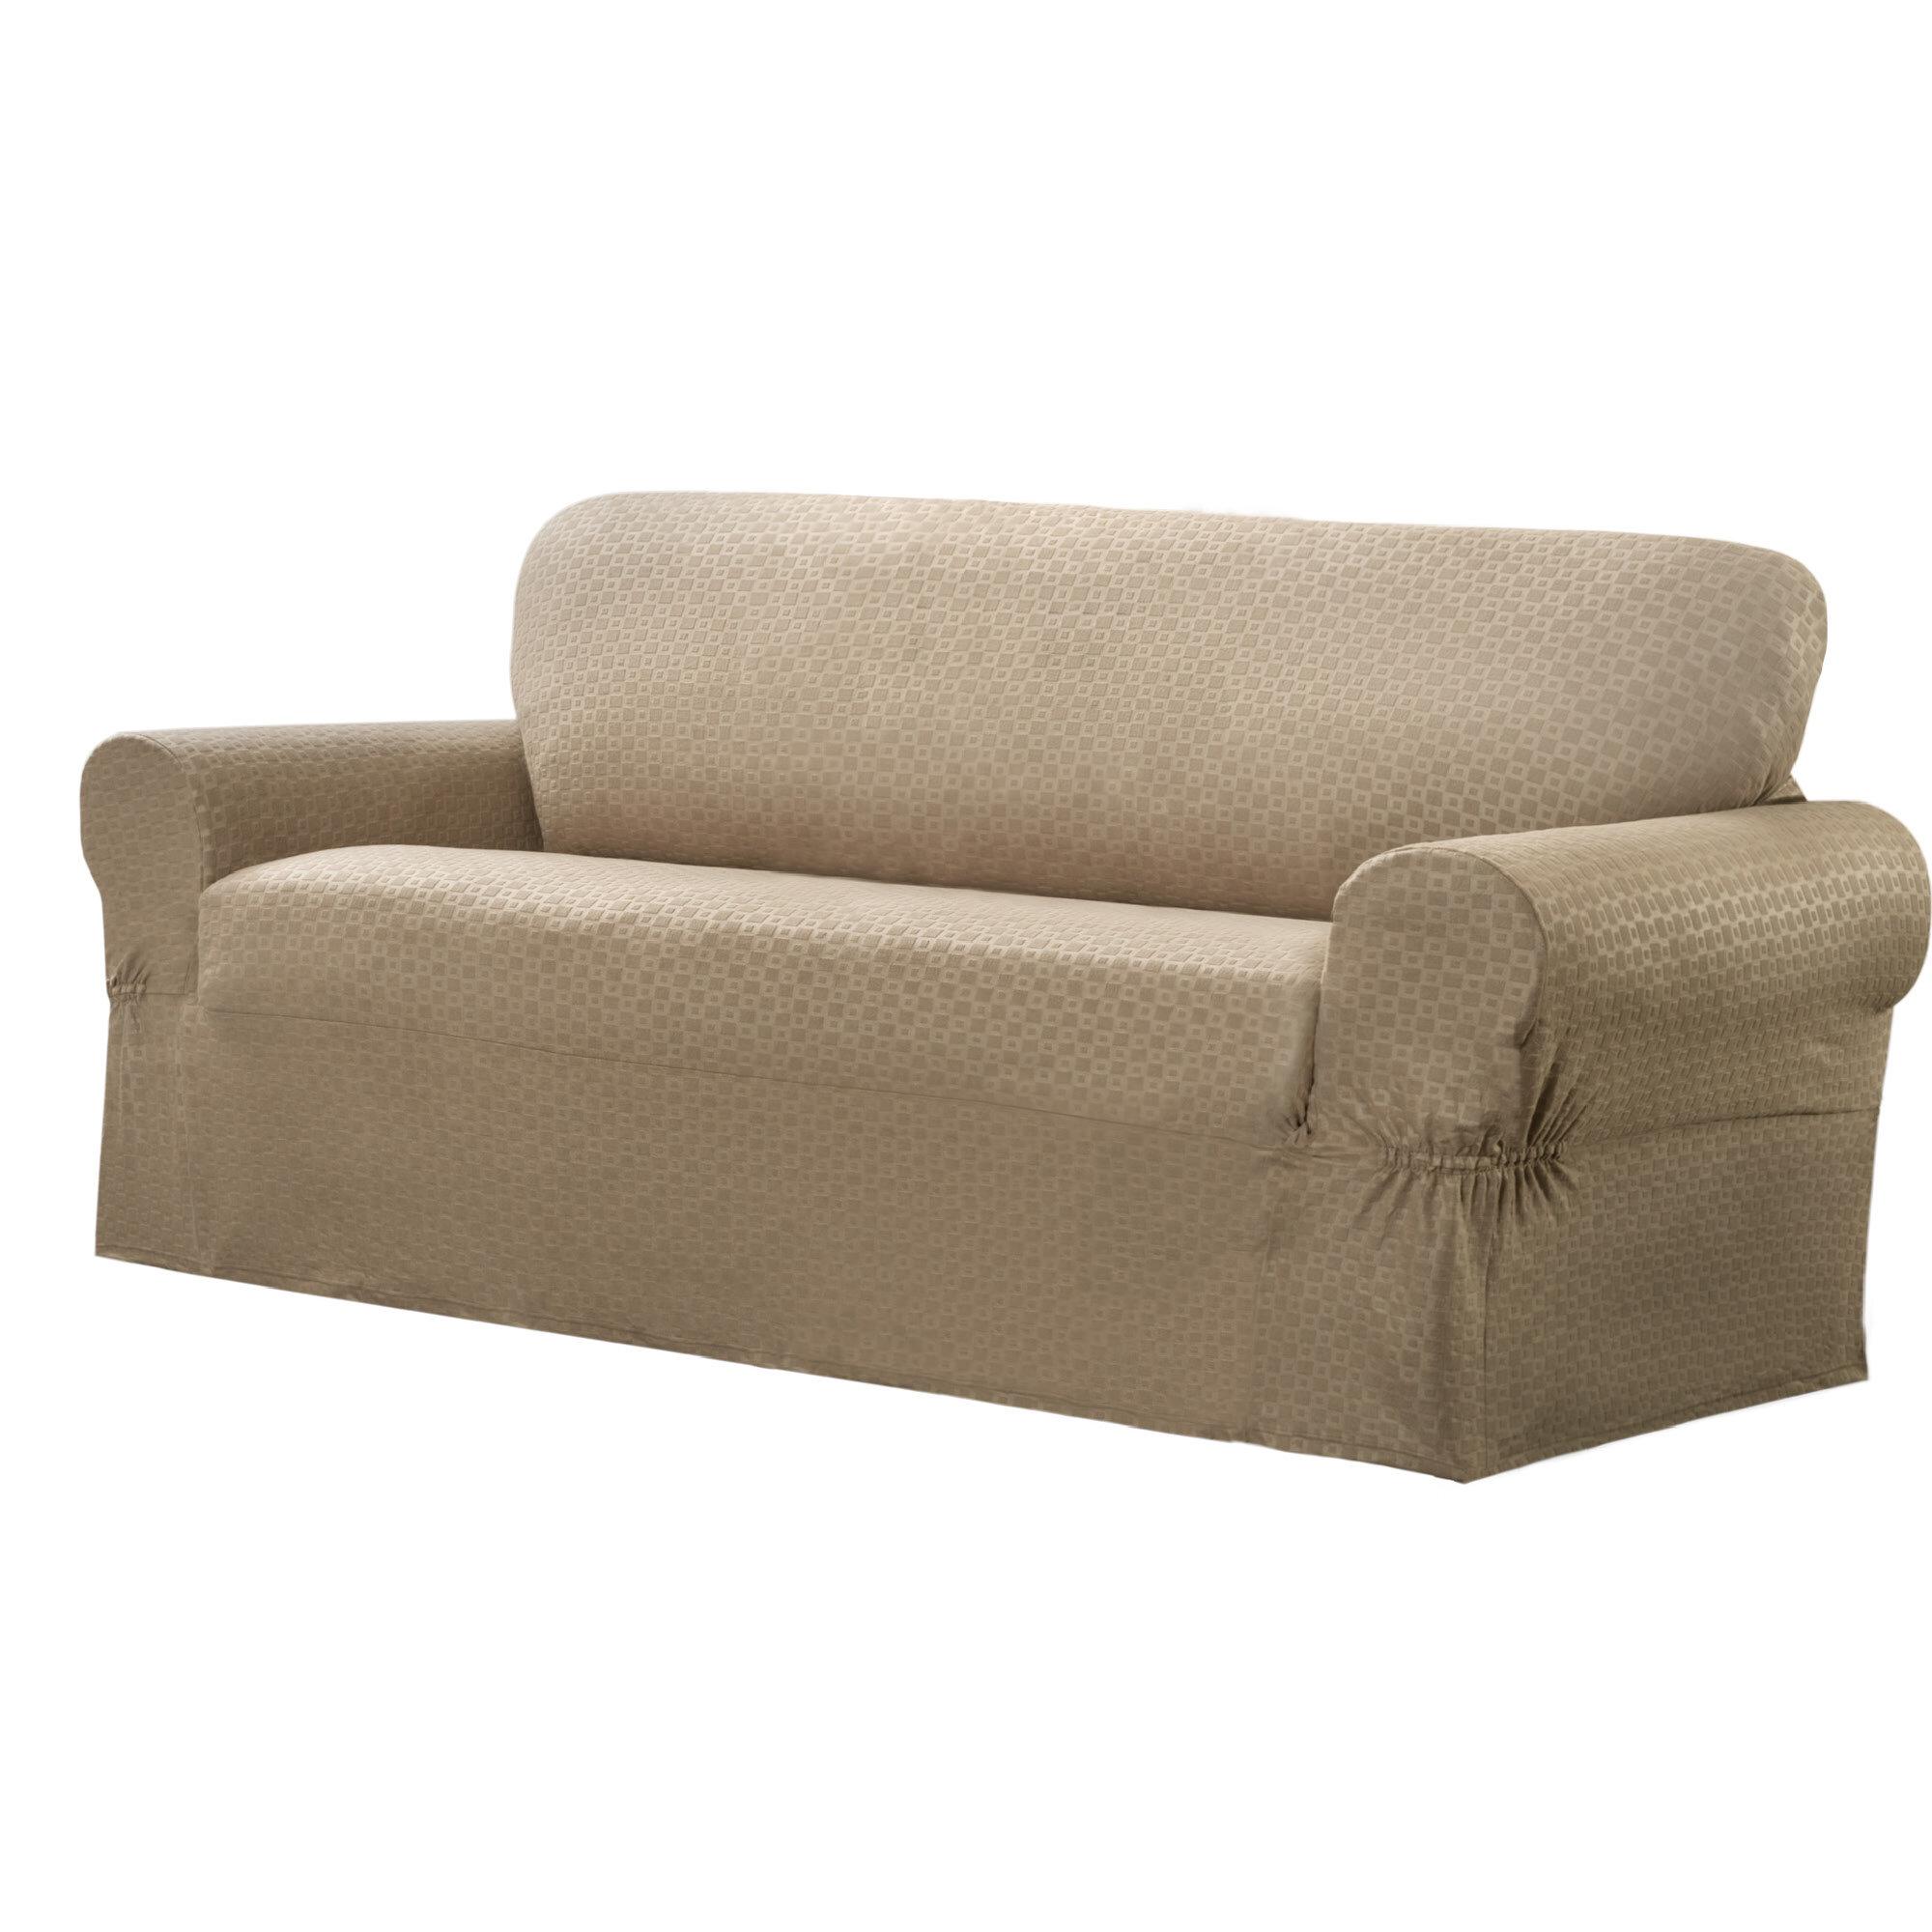 New Slipcover Stretch Sofa Cover Sofa With Loveseat Chair: Maytex Conrad Stretch Sofa Box Cushion Slipcover